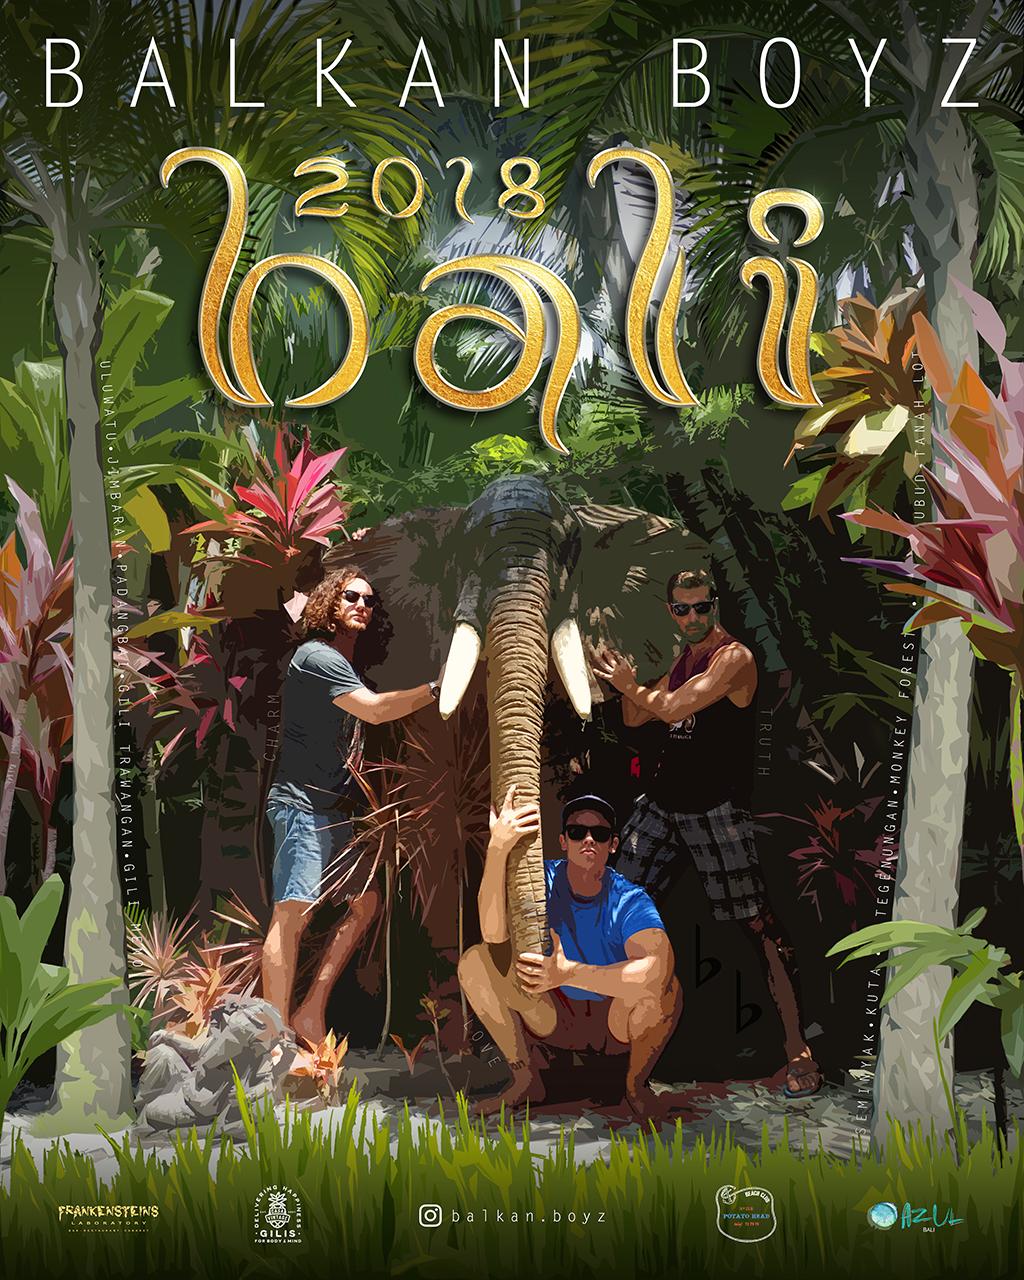 Balkan Boyz - Bali Poster - MASTER - 06